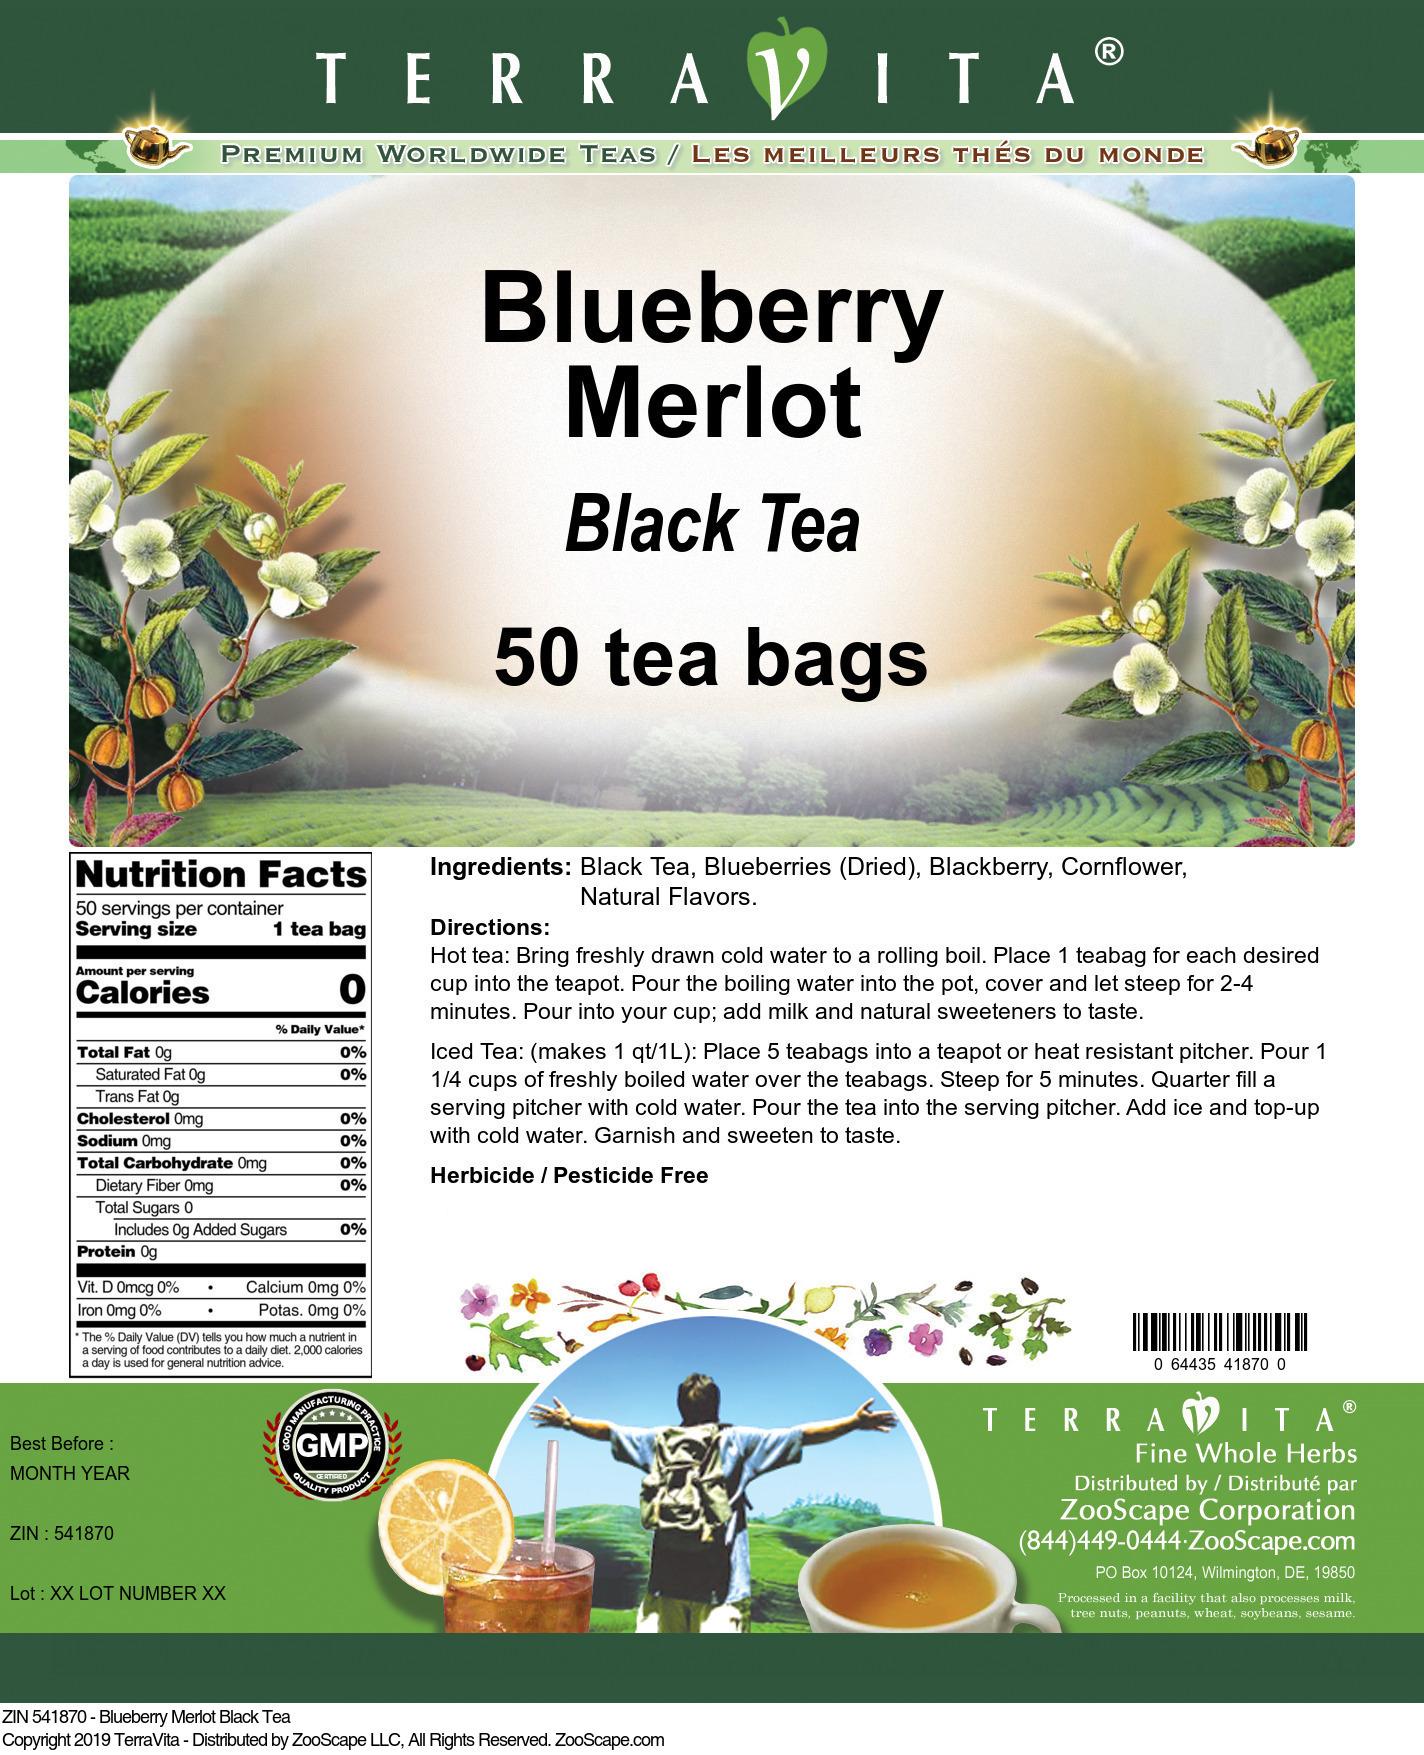 Blueberry Merlot Black Tea